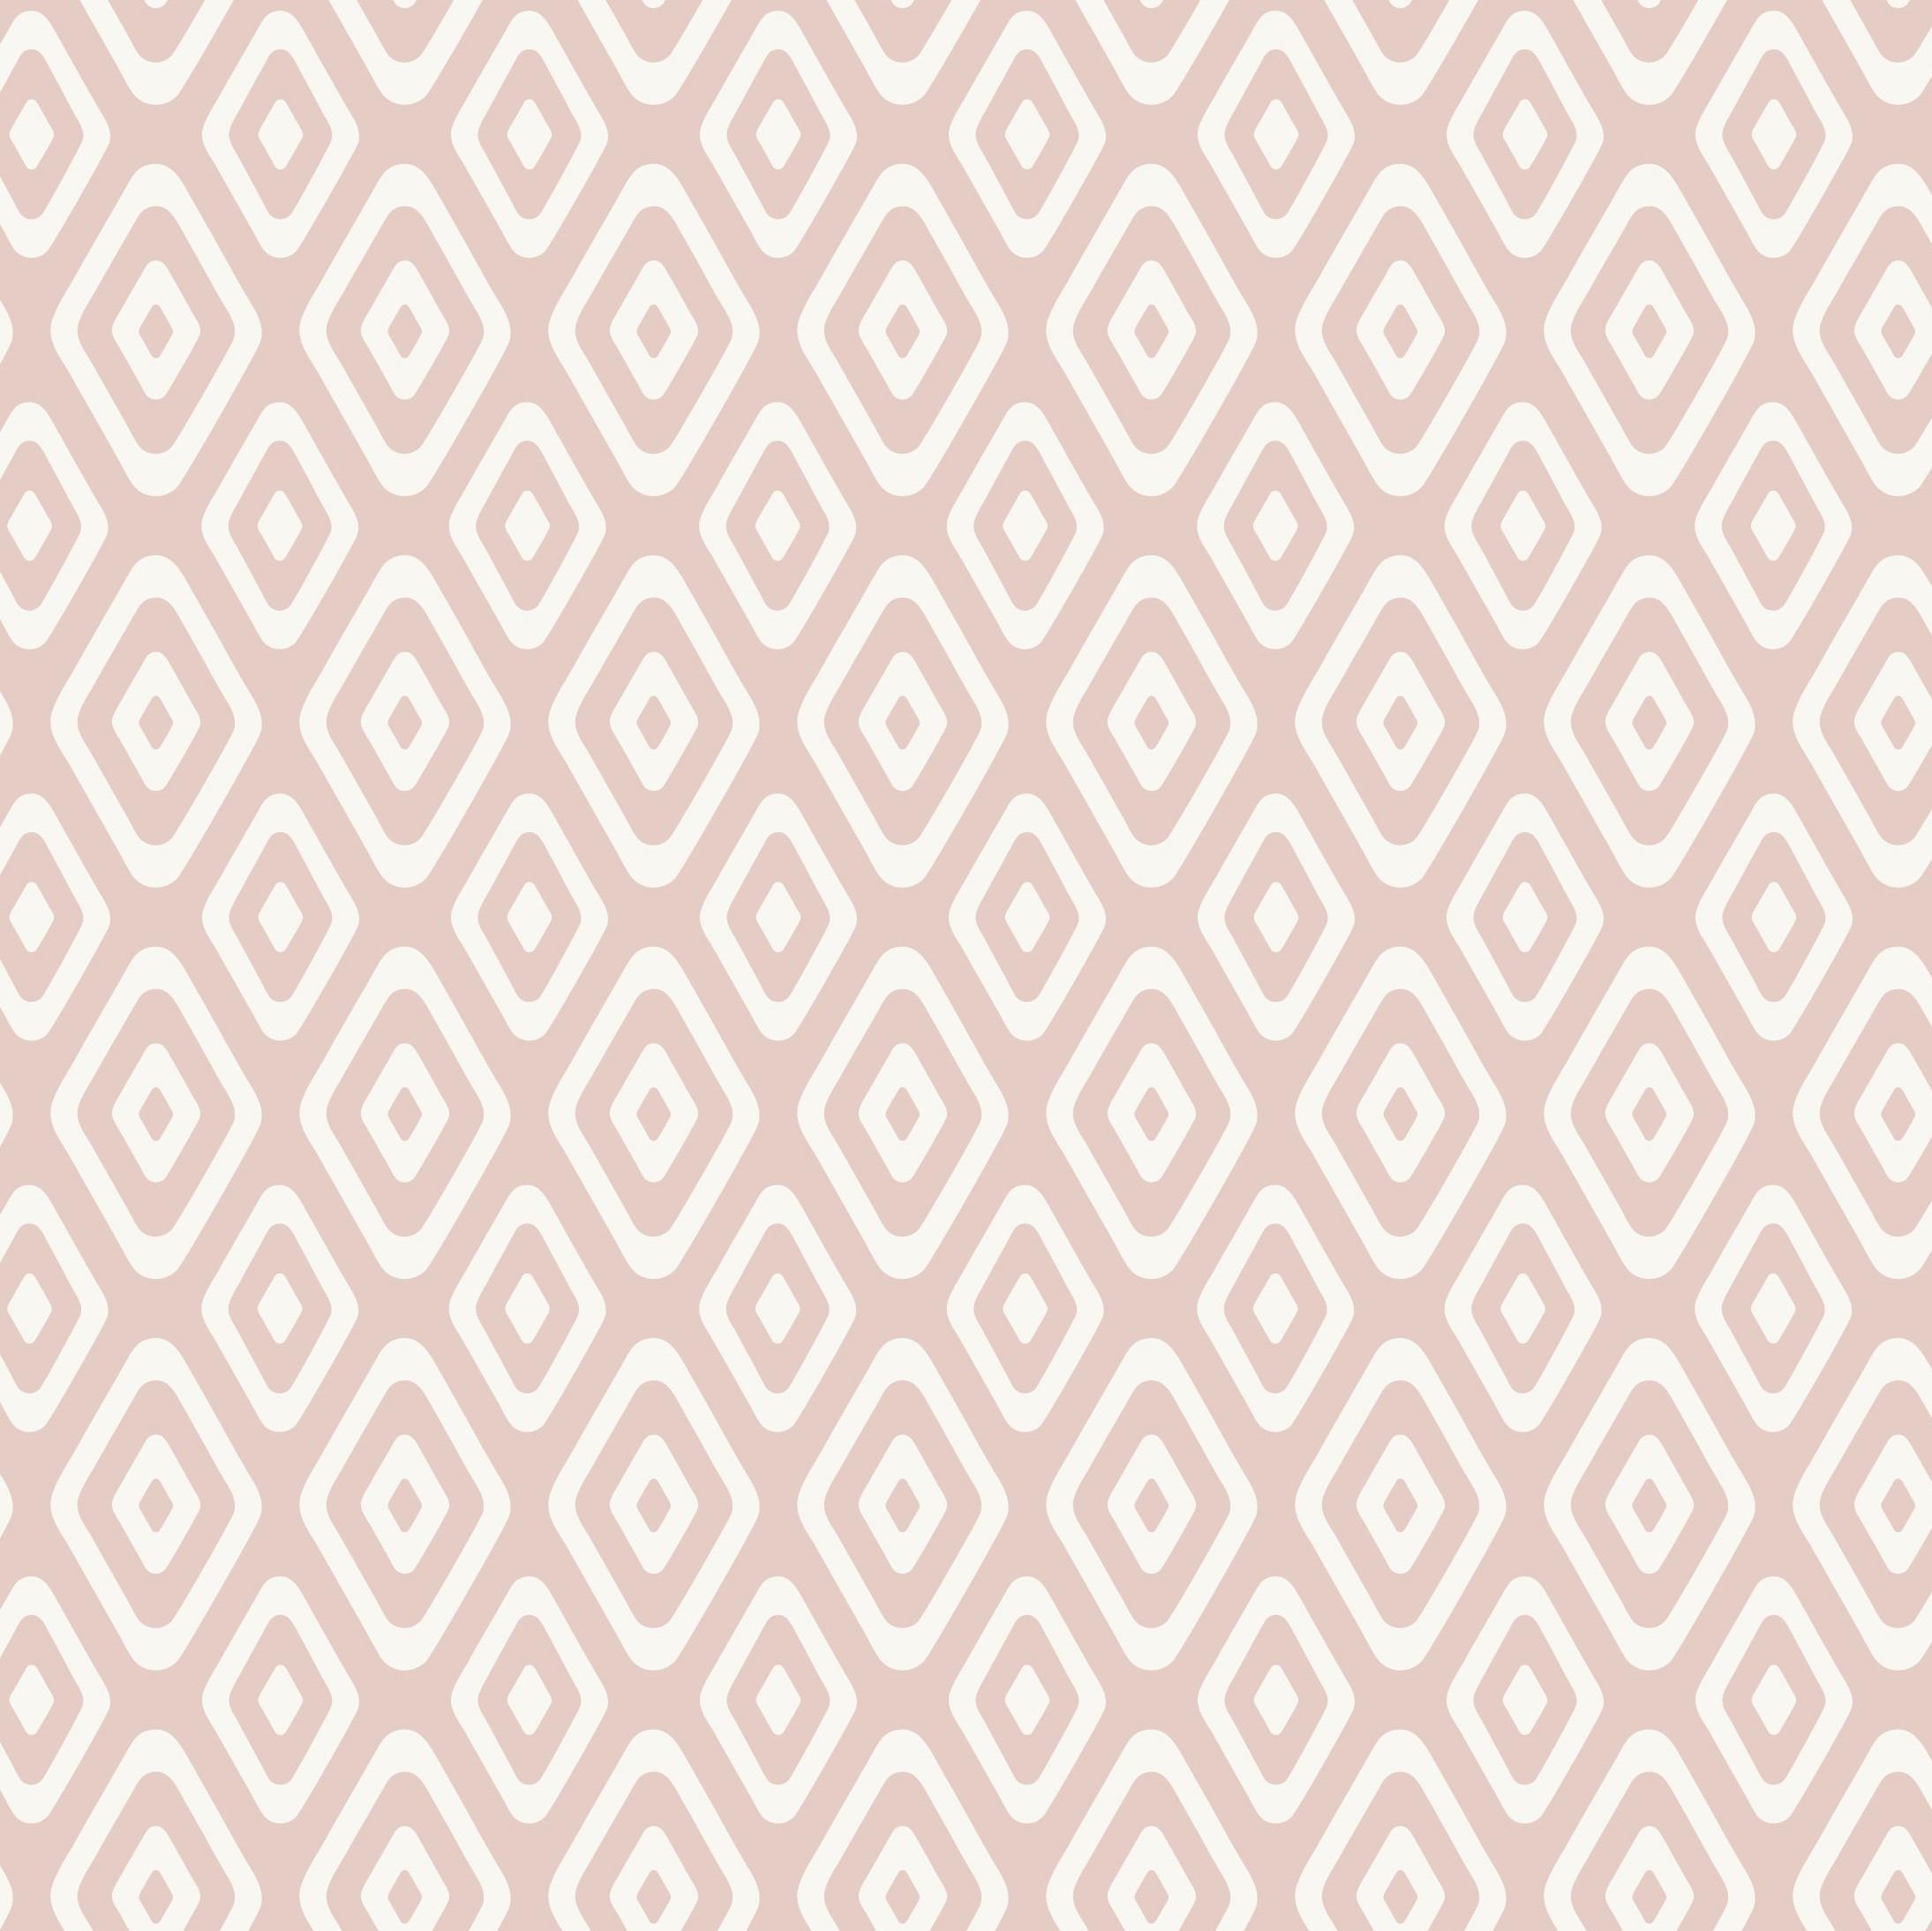 Posiedon Geo Triangle Dusky Pink Craft Fabric